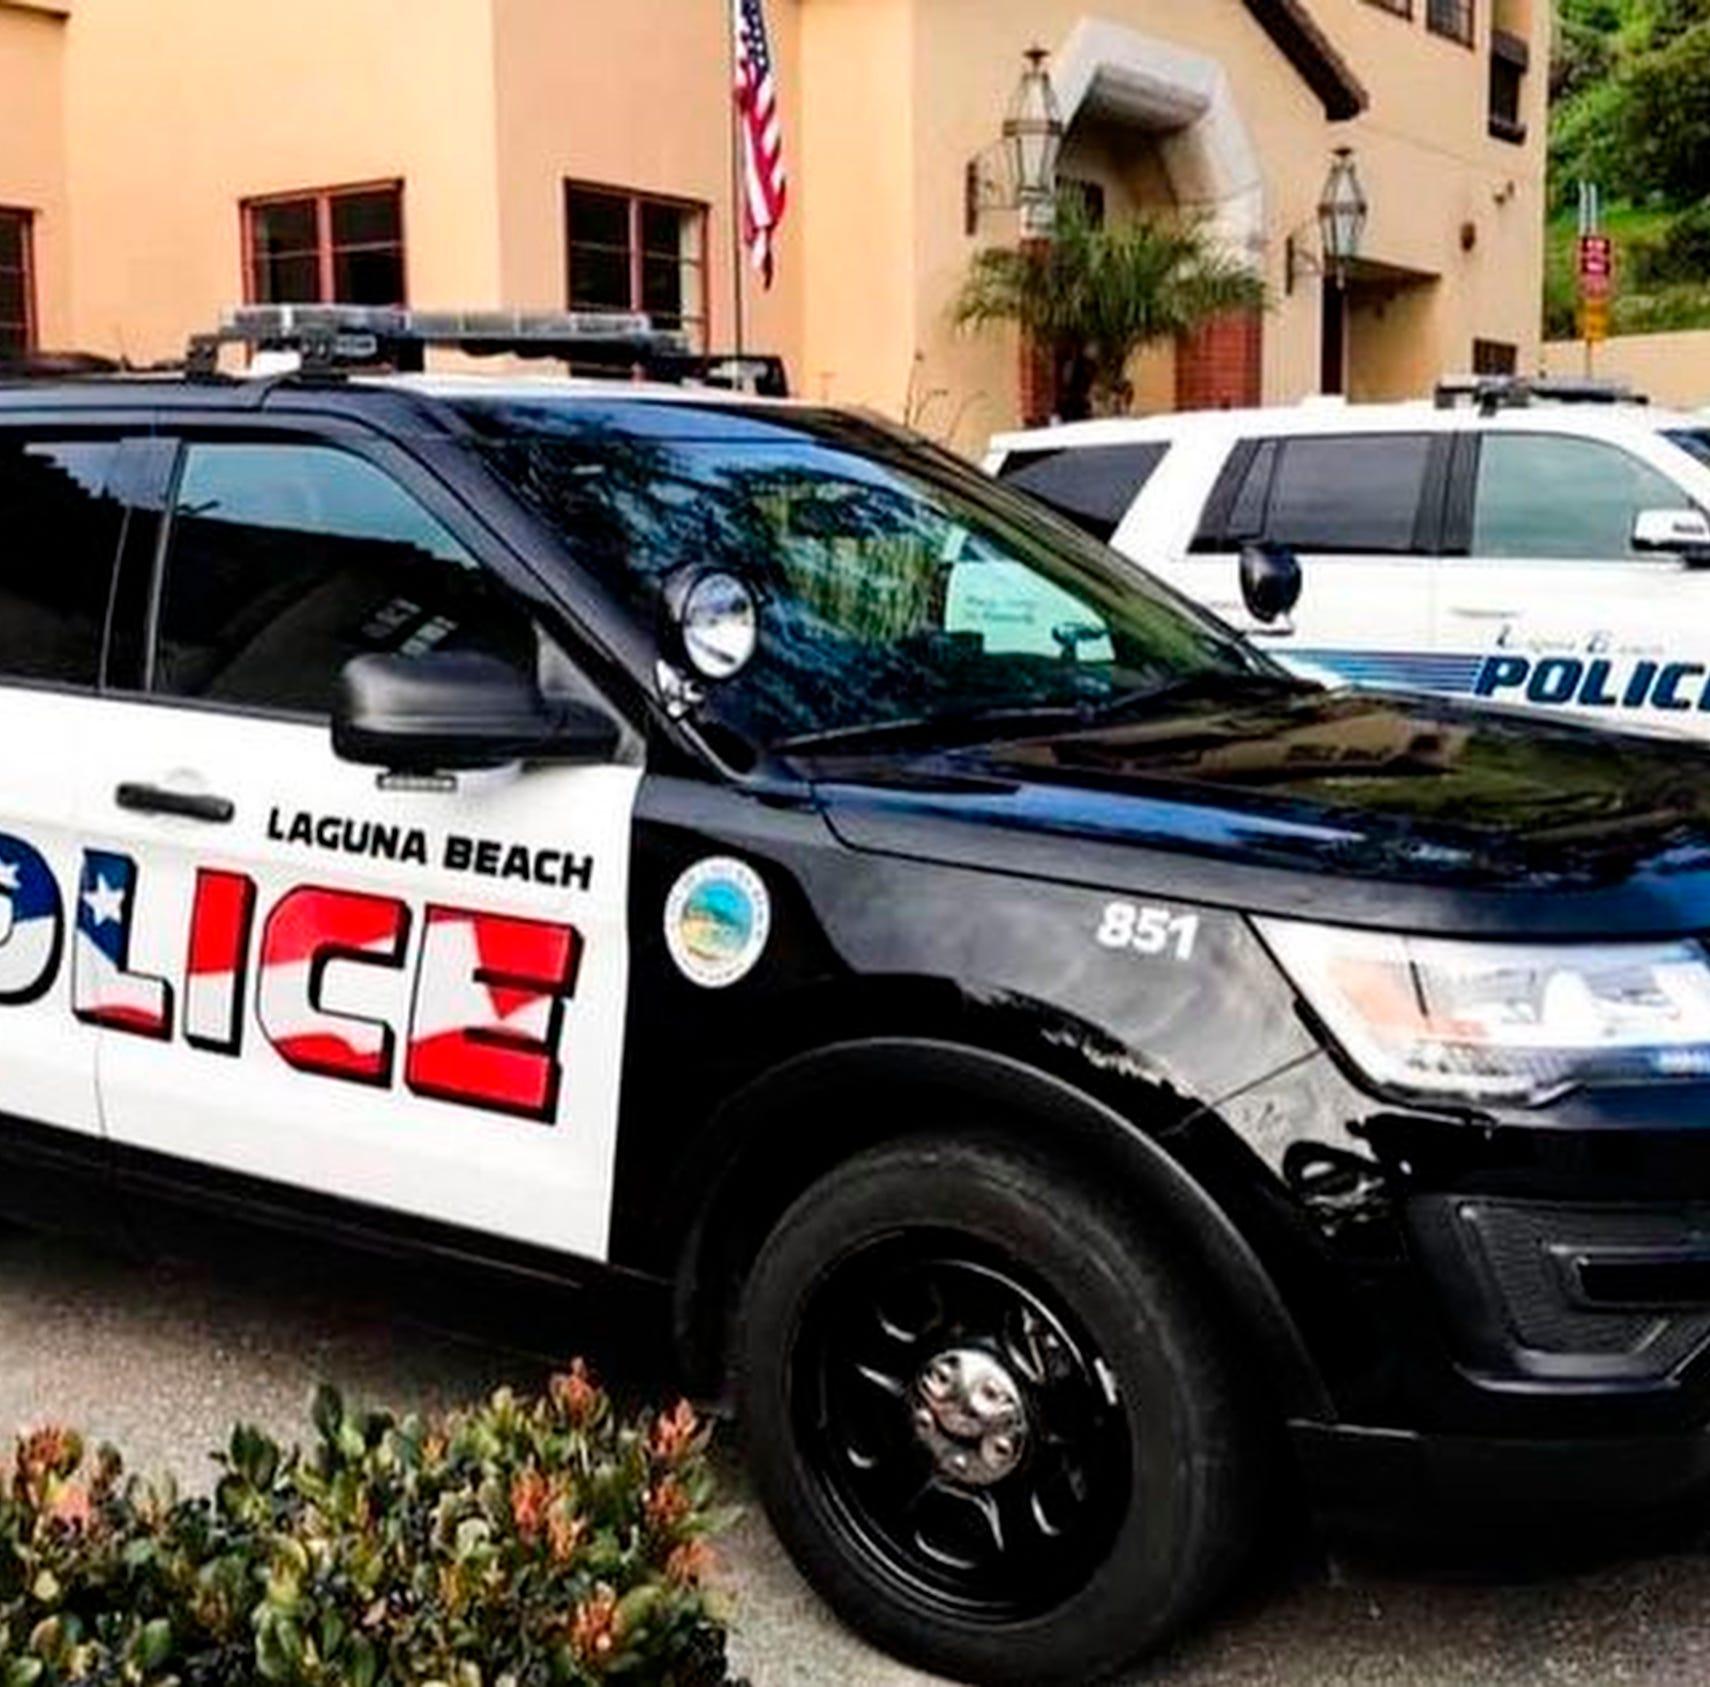 American flag graphic on police cars divides Laguna Beach